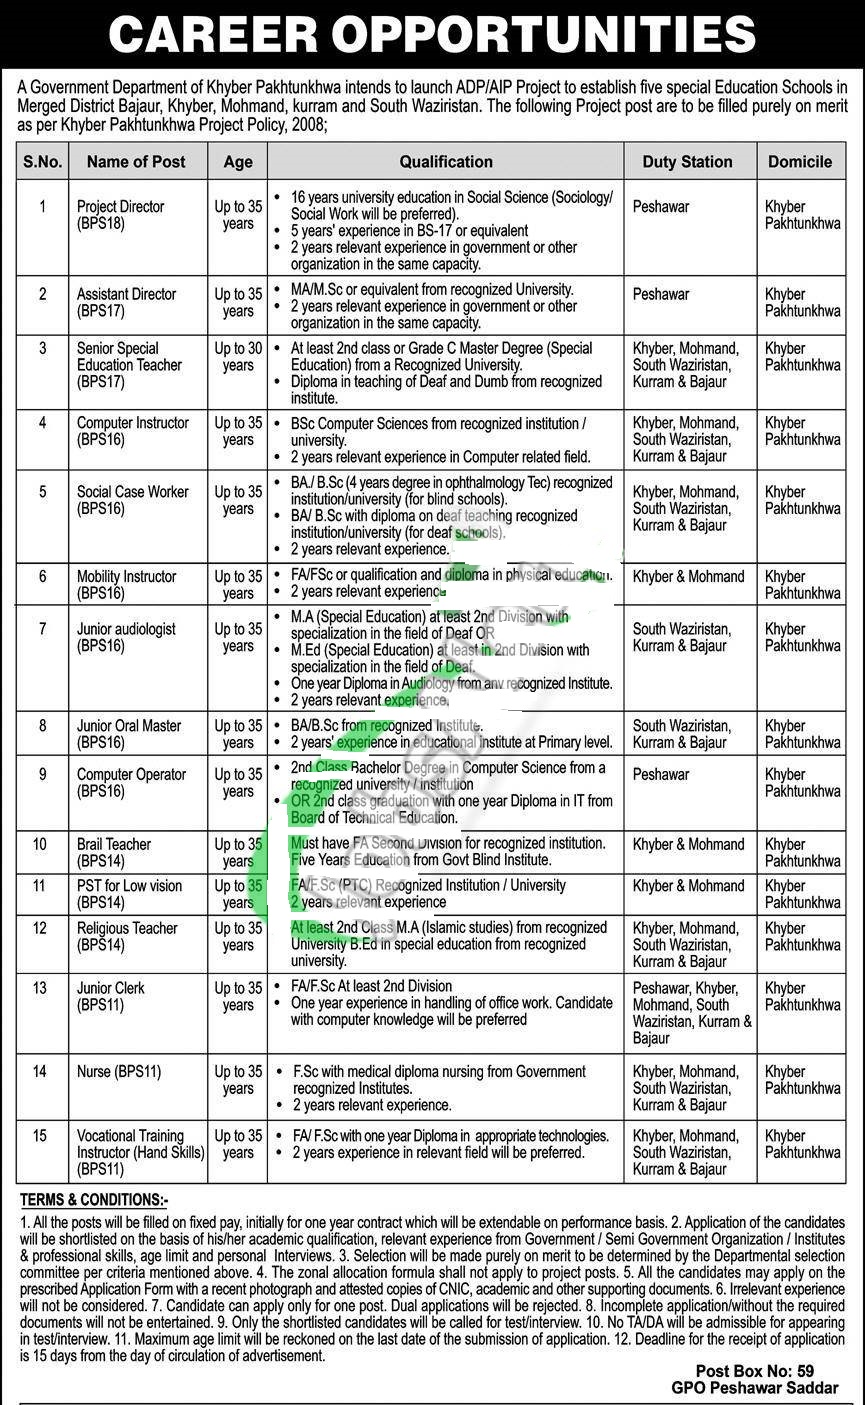 How To Apply for PO Box 59 GPO Peshawar Jobs: